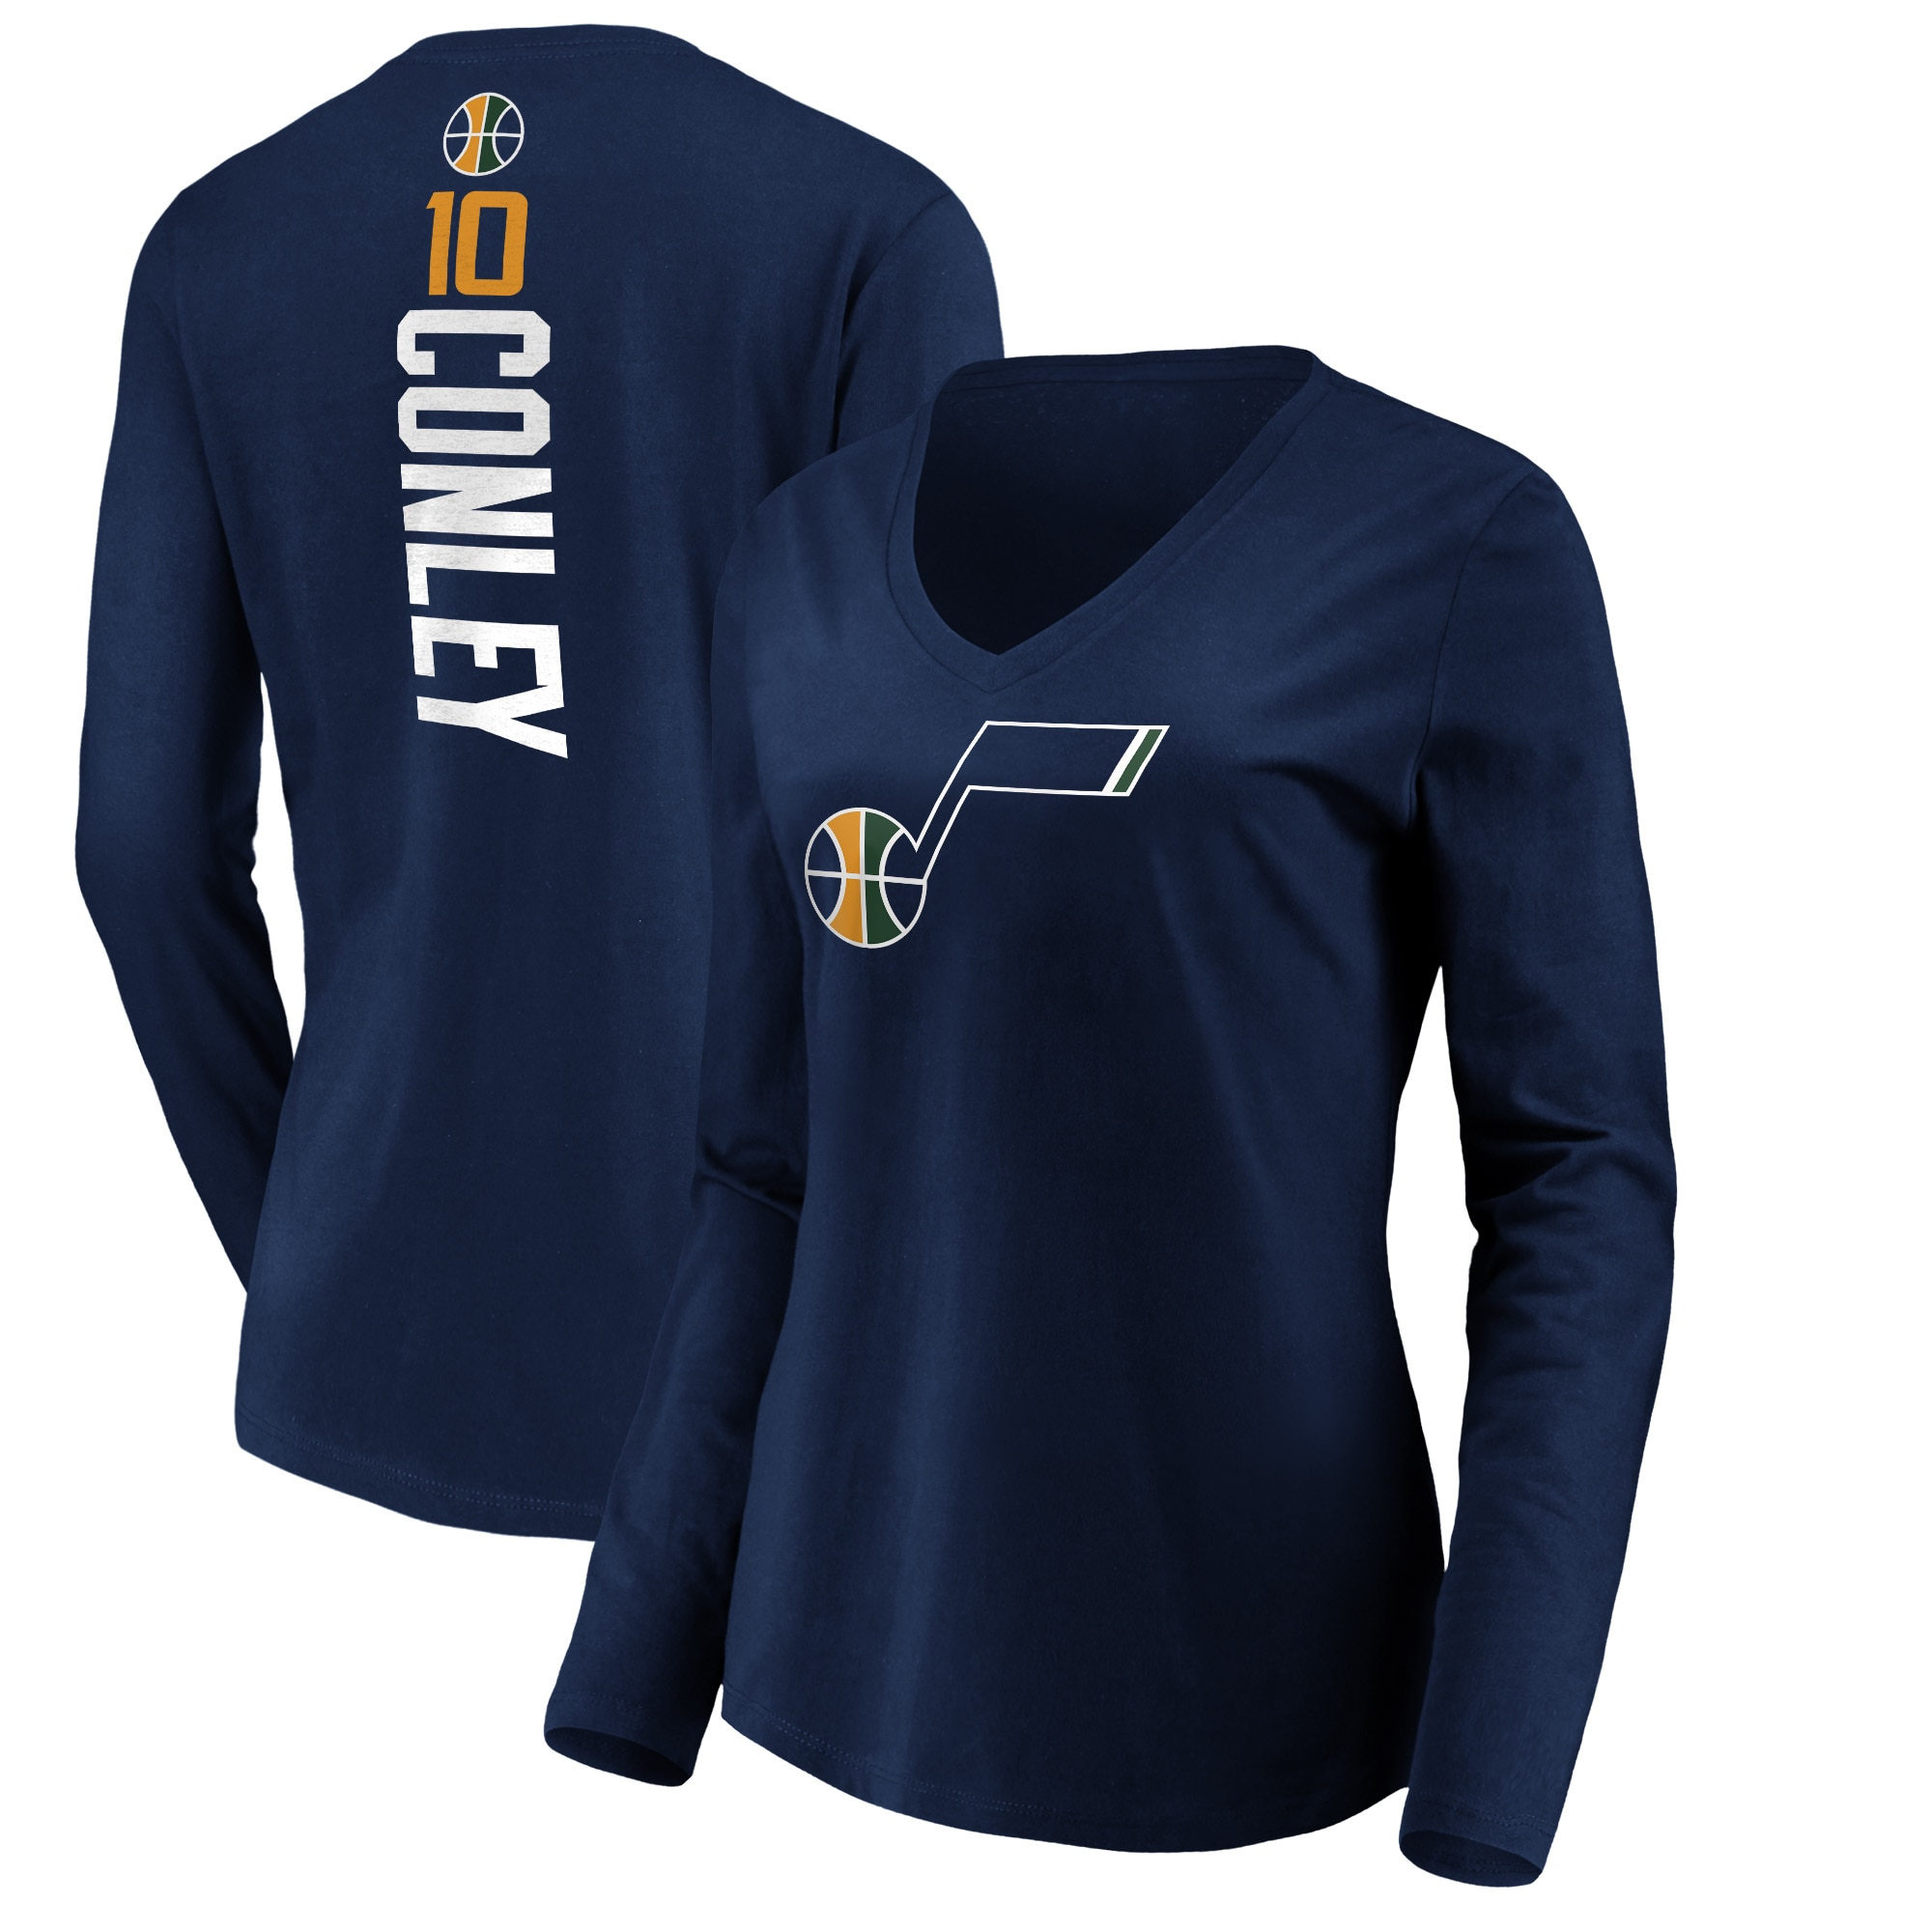 Mike Conley Utah Jazz Fanatics Branded Women's Playmaker Name & Number Long Sleeve T-Shirt - Navy